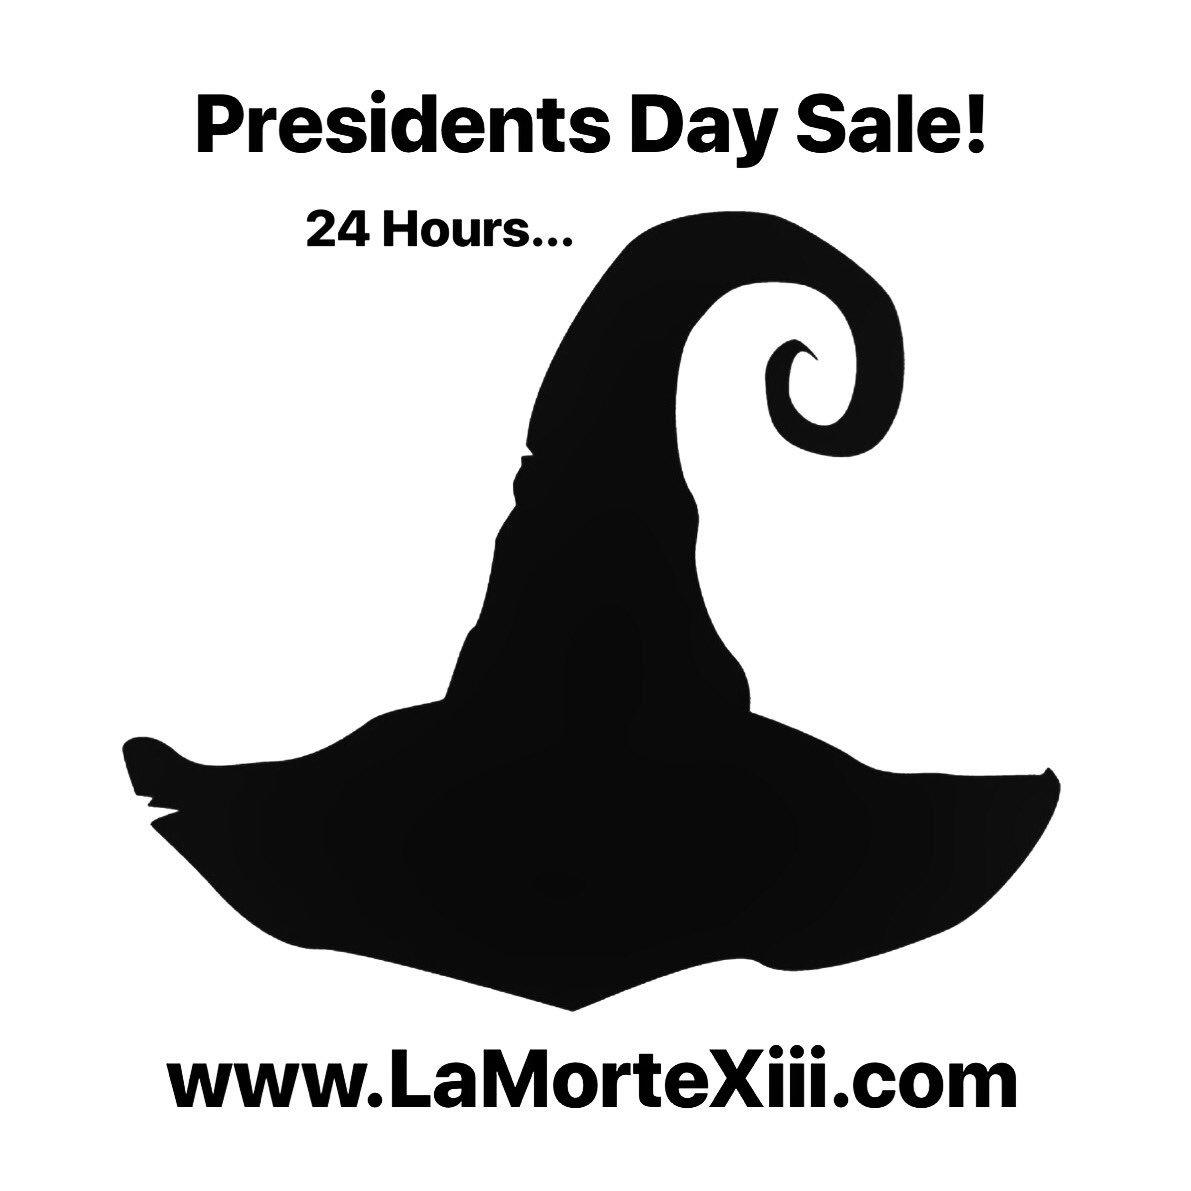 24 Hour Presidents Day Sale! http://www.LaMorteXiii.com #lamortexiii #PresidentsDay #sale #potus #iheartyou